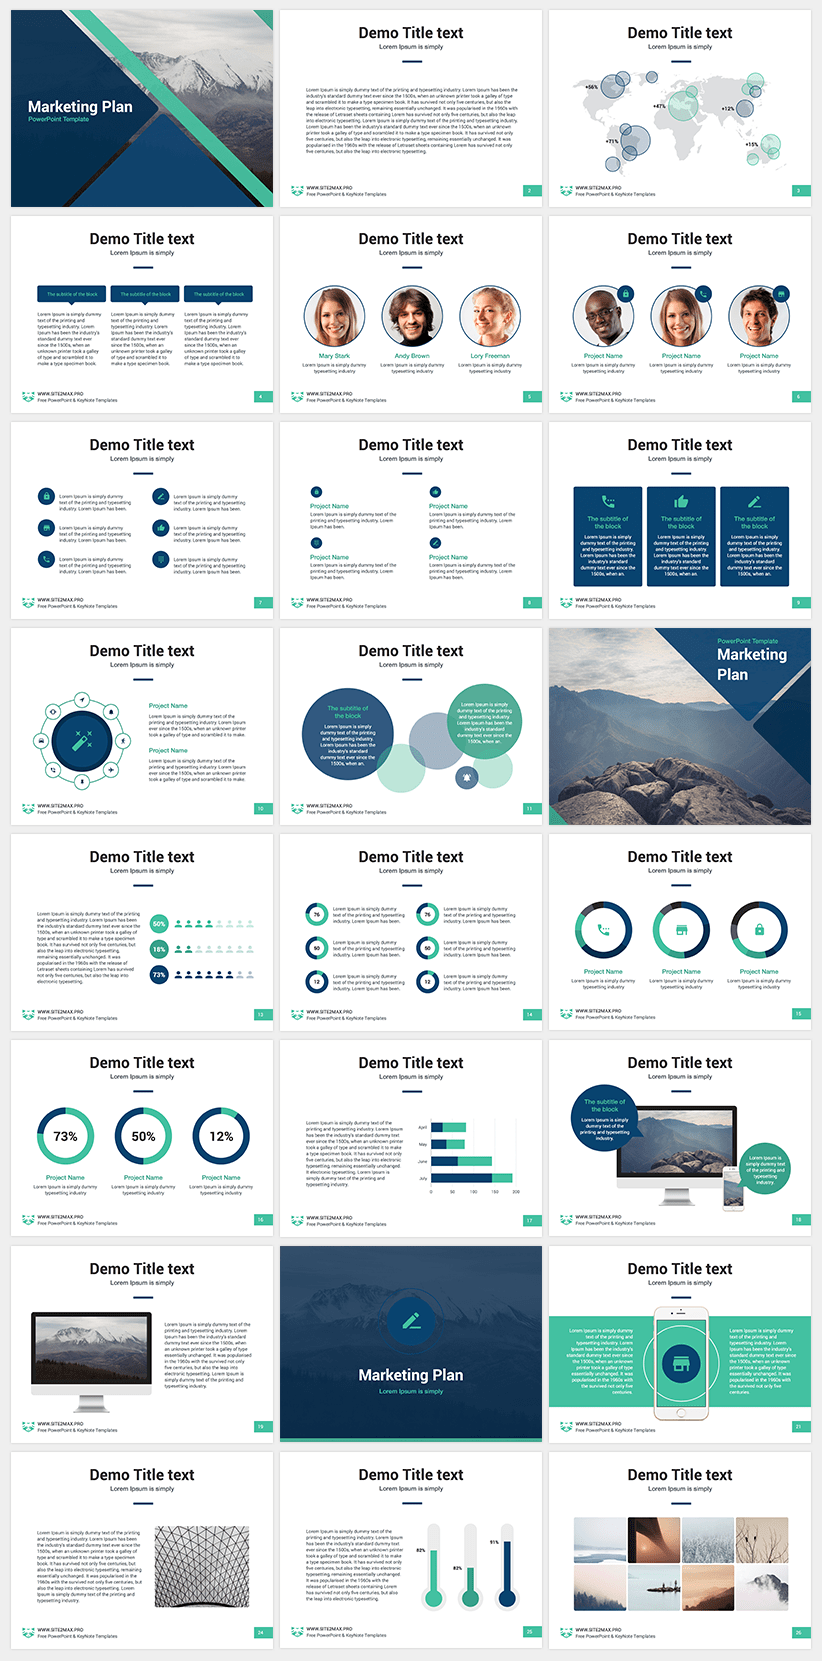 free powerpoint template marketing plan